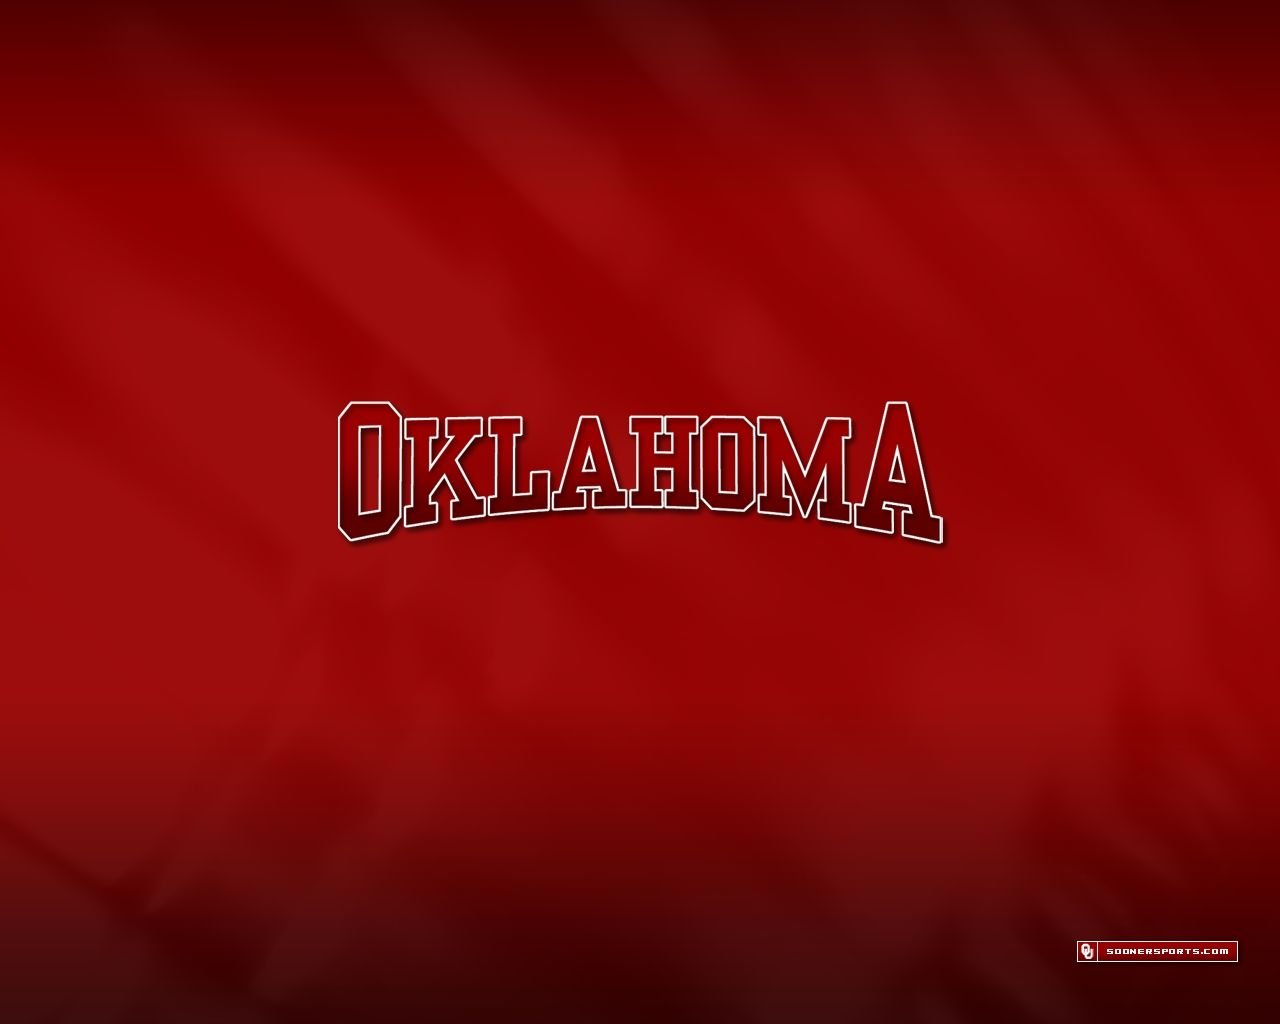 Oklahoma Sooners Wallpaper 25106 Wallpapers HD colourinwallpaper 1280x1024